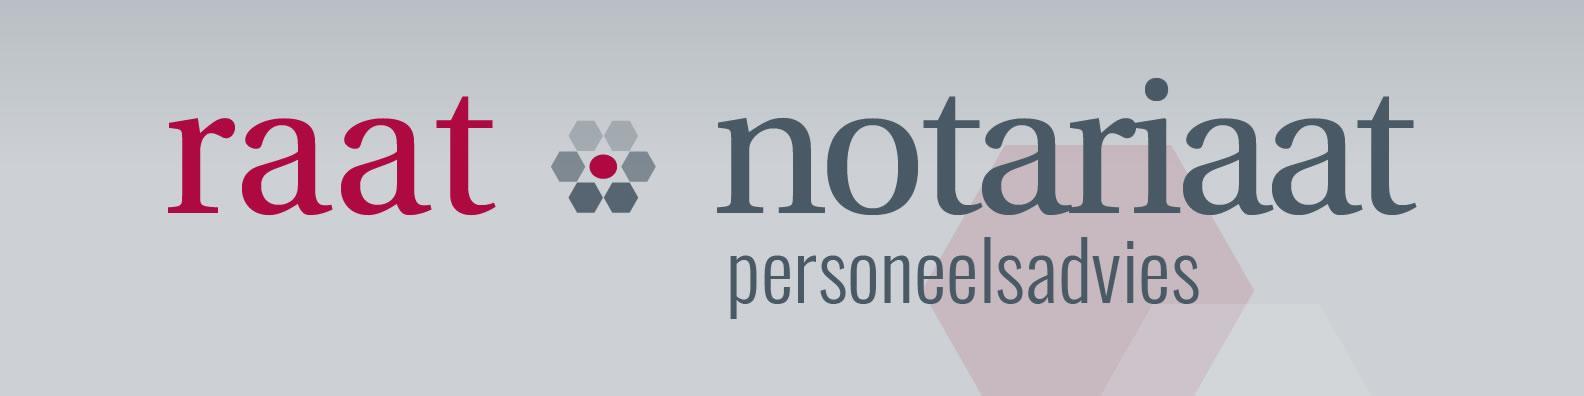 Kandidaat- notaris OG